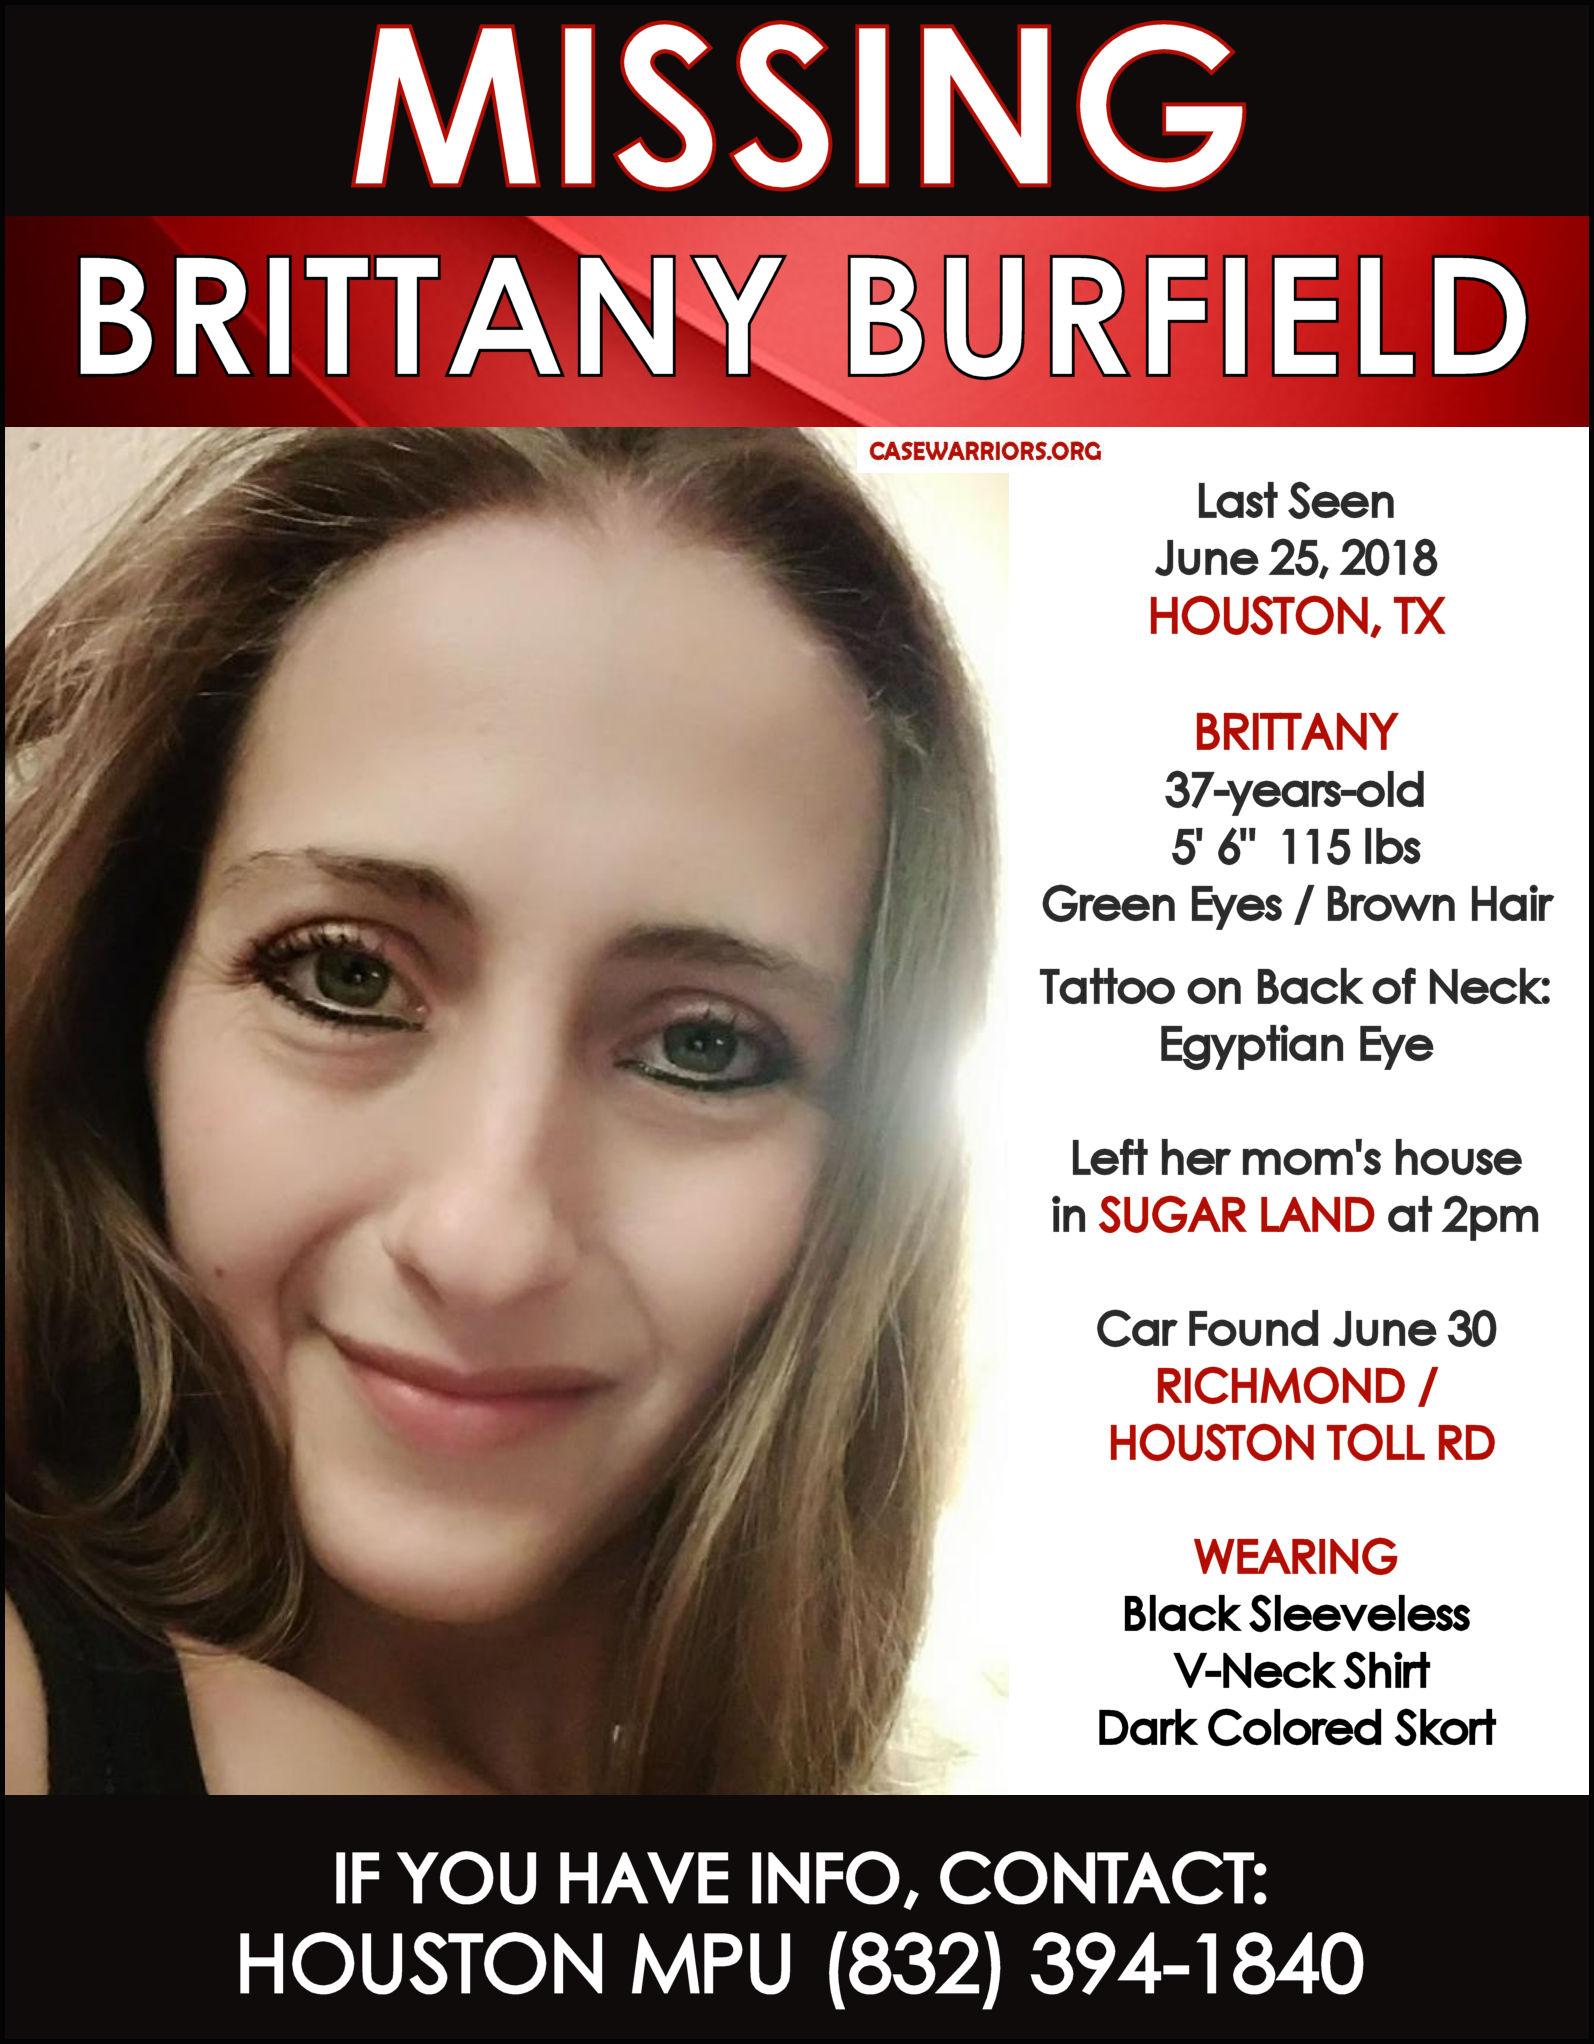 BRITTANY BURFIELD